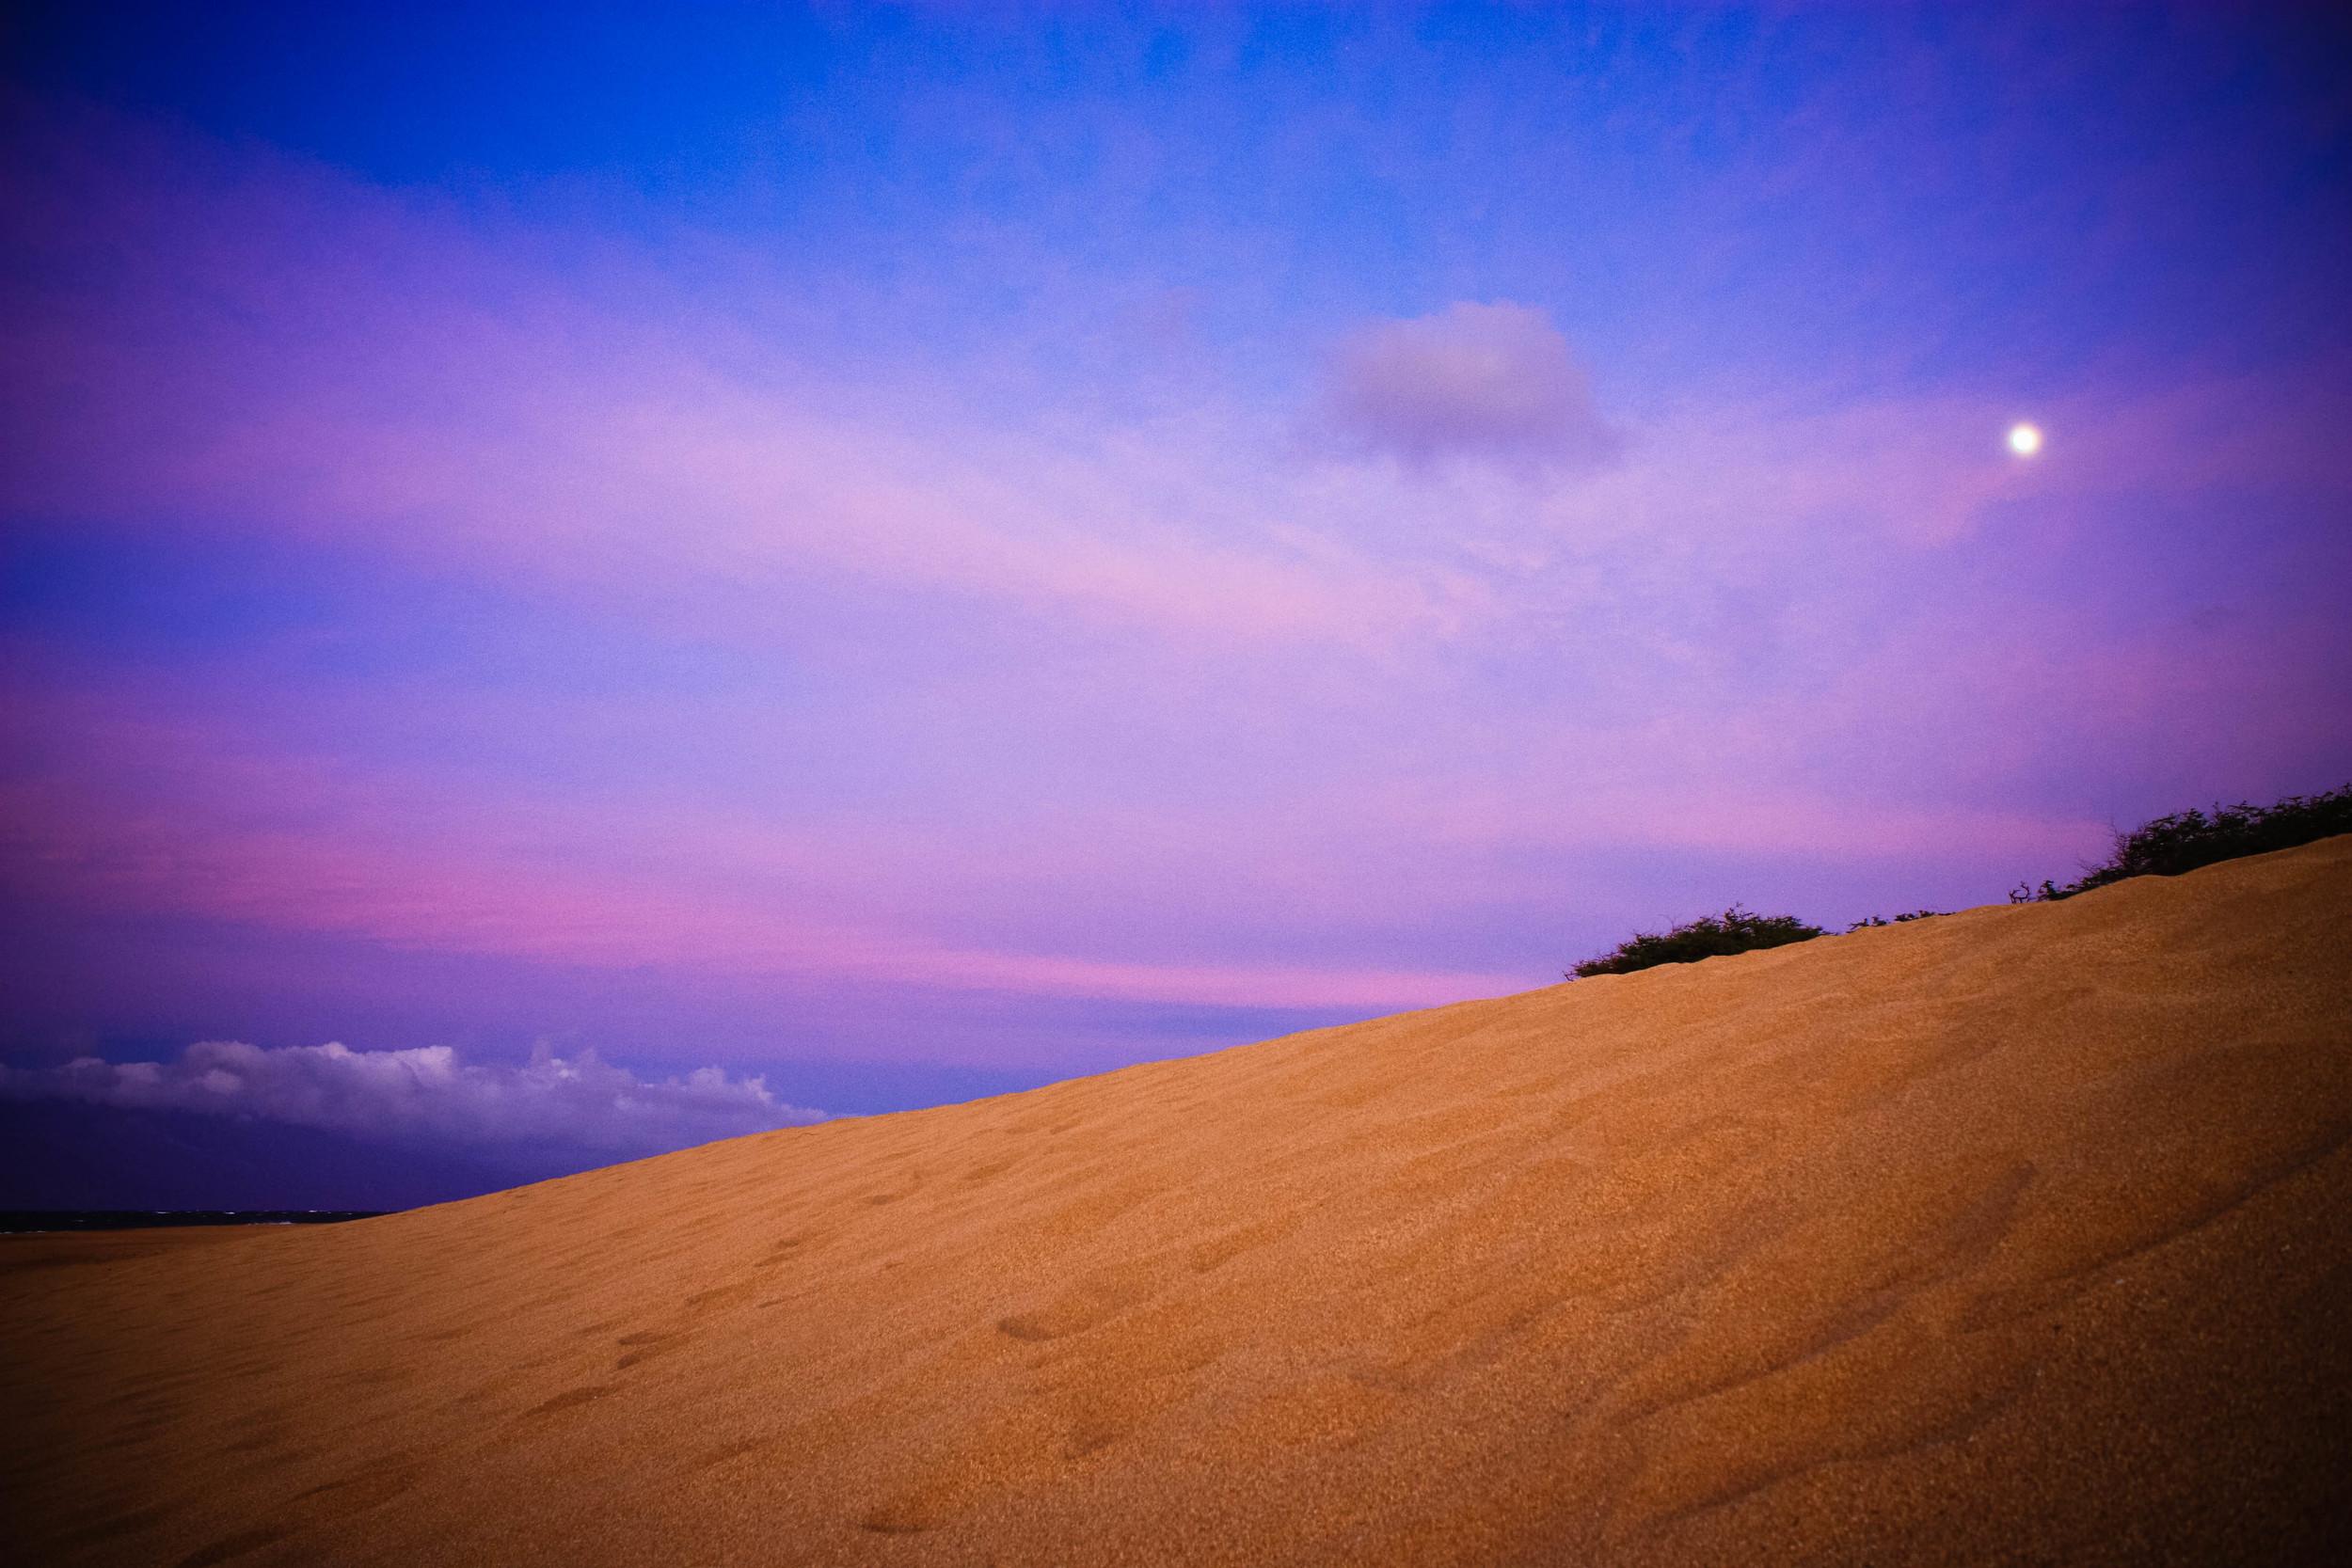 Sunset at Polihua Beach